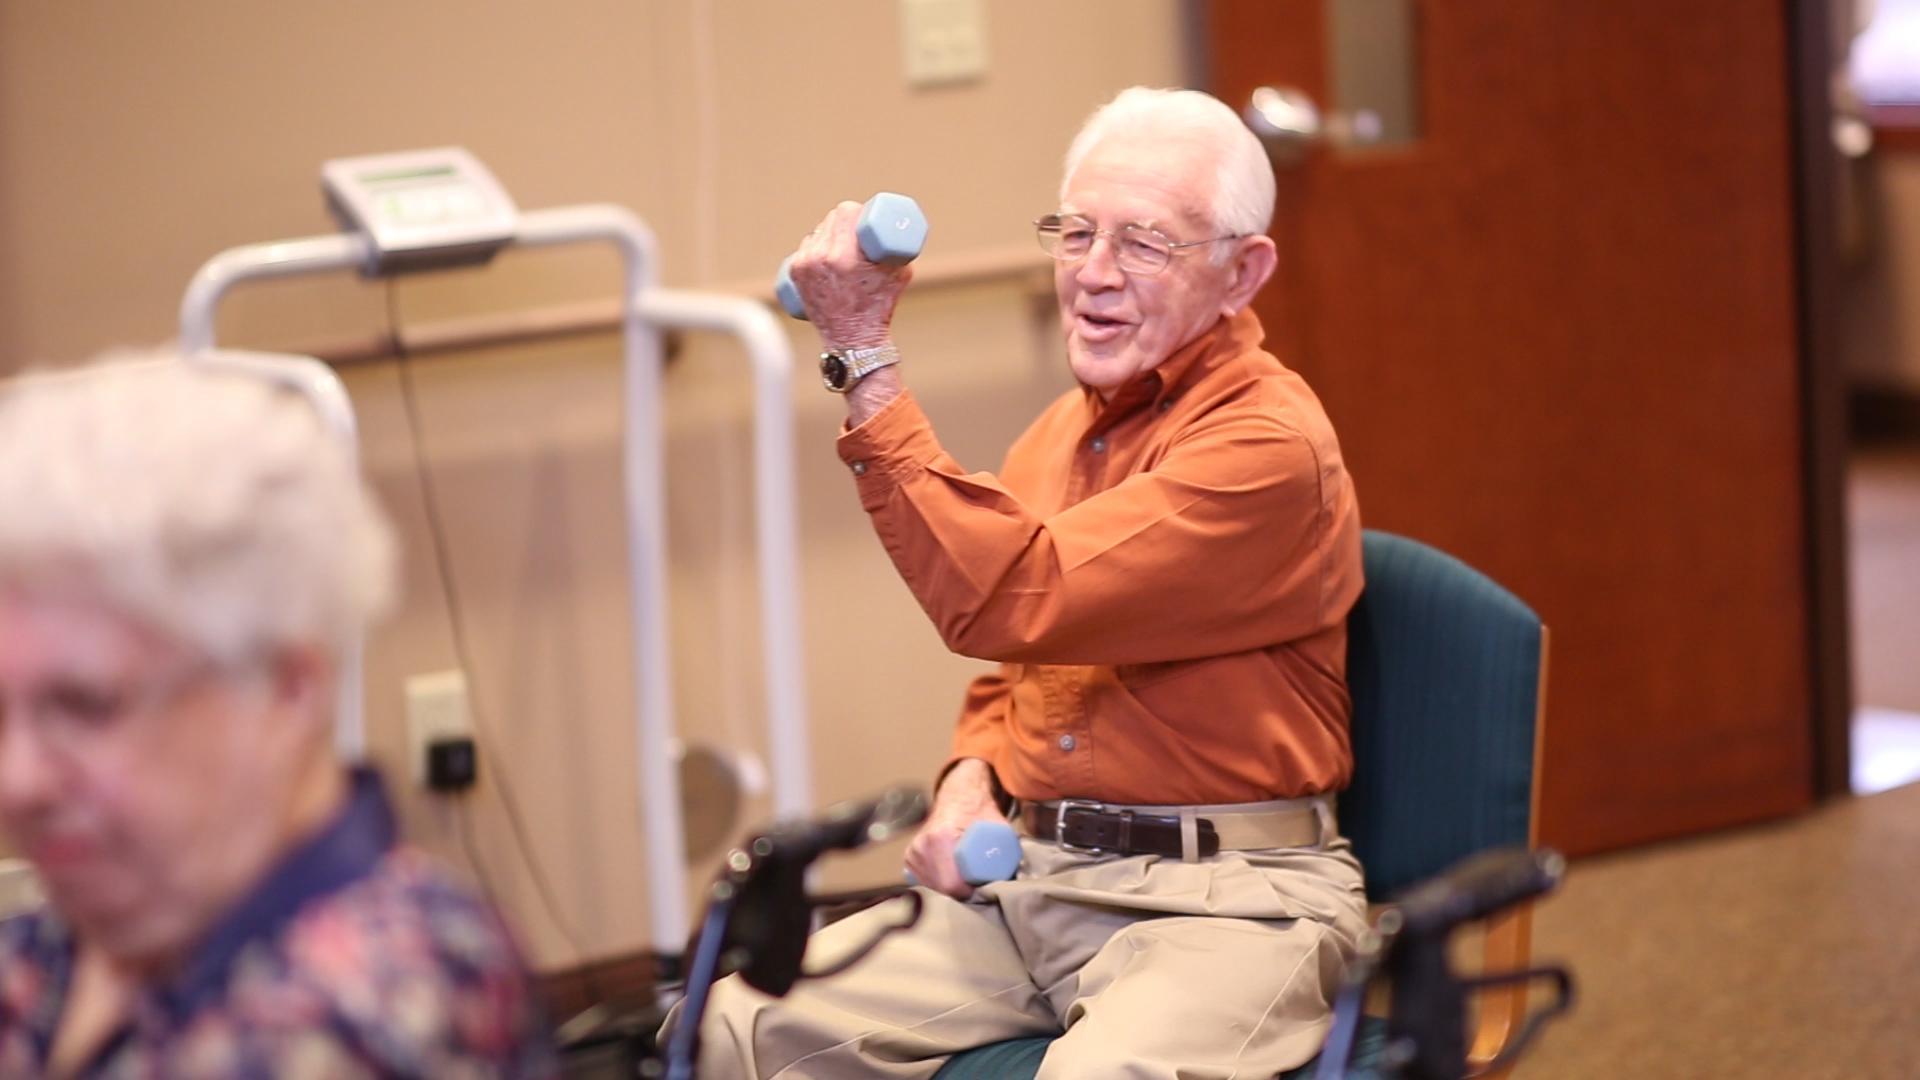 Rehabilitation and Healthcare